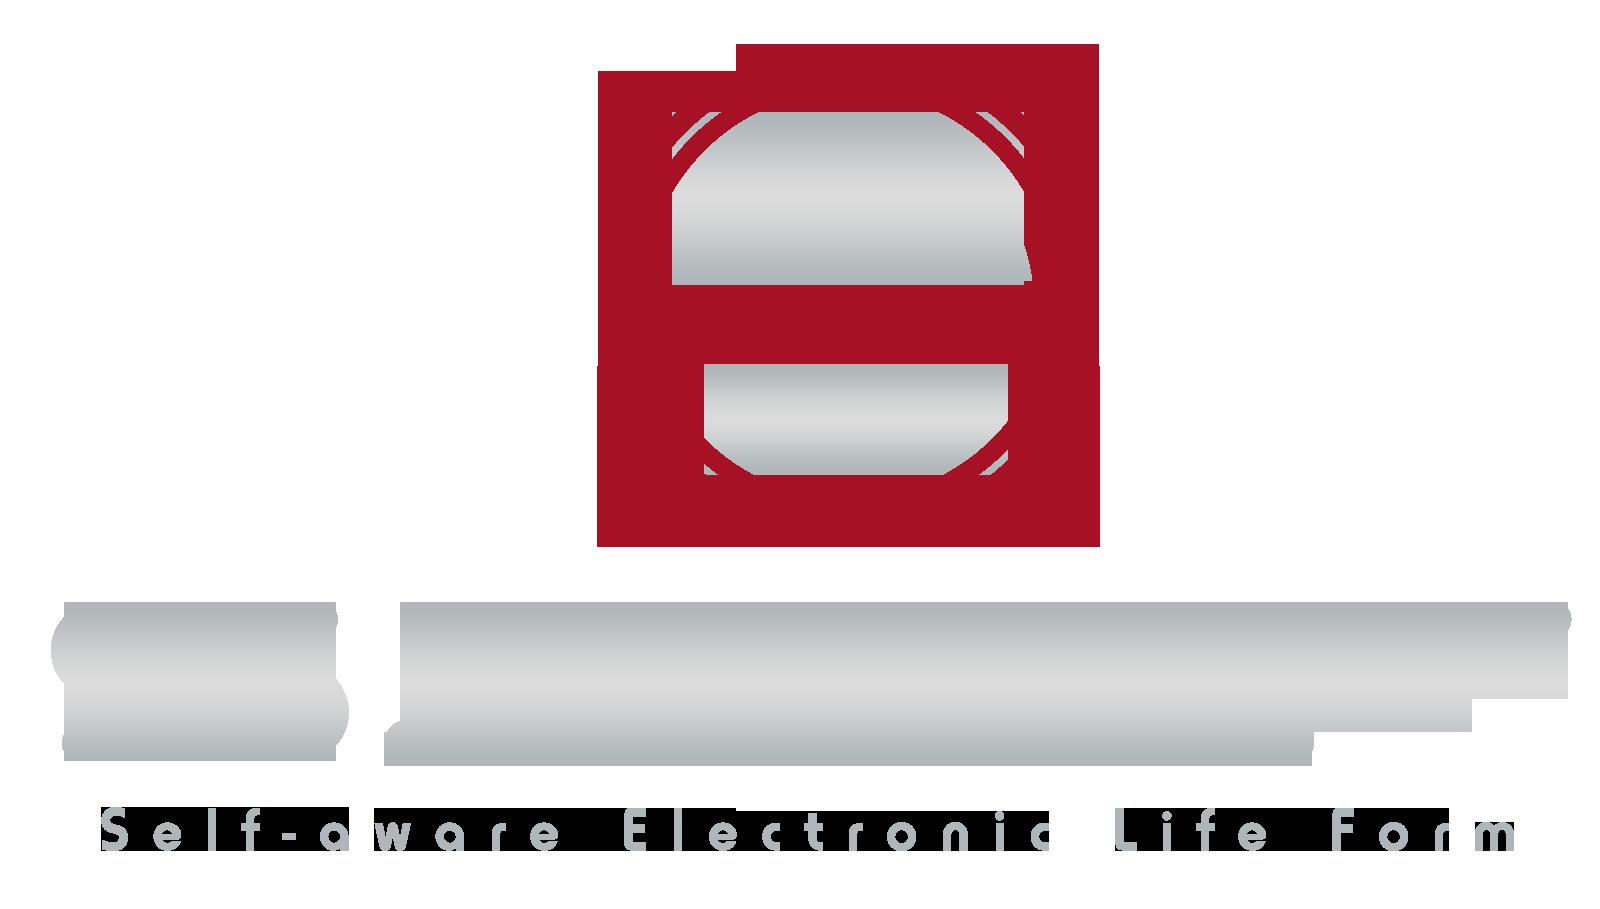 S.E.L.F. - Self-aware Electronic Life Form